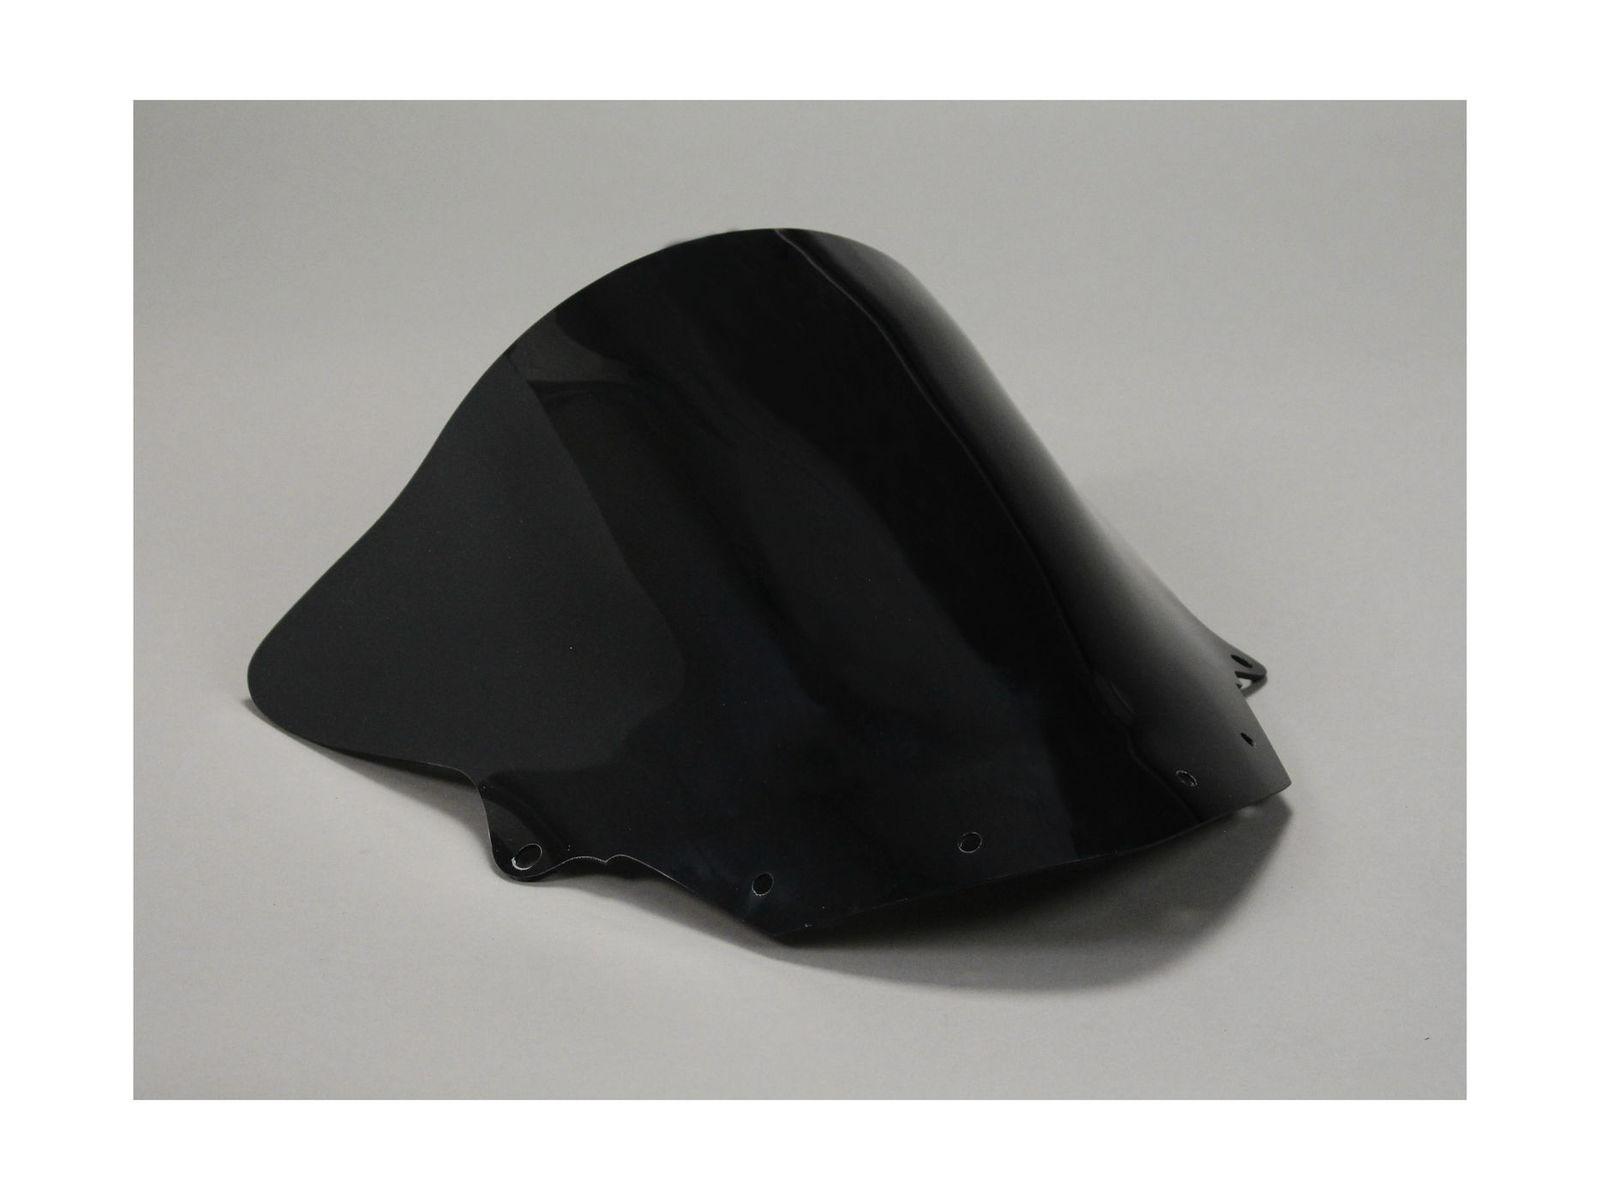 Steklo vetrovoe zx 6r 09 10 chernoe 78065